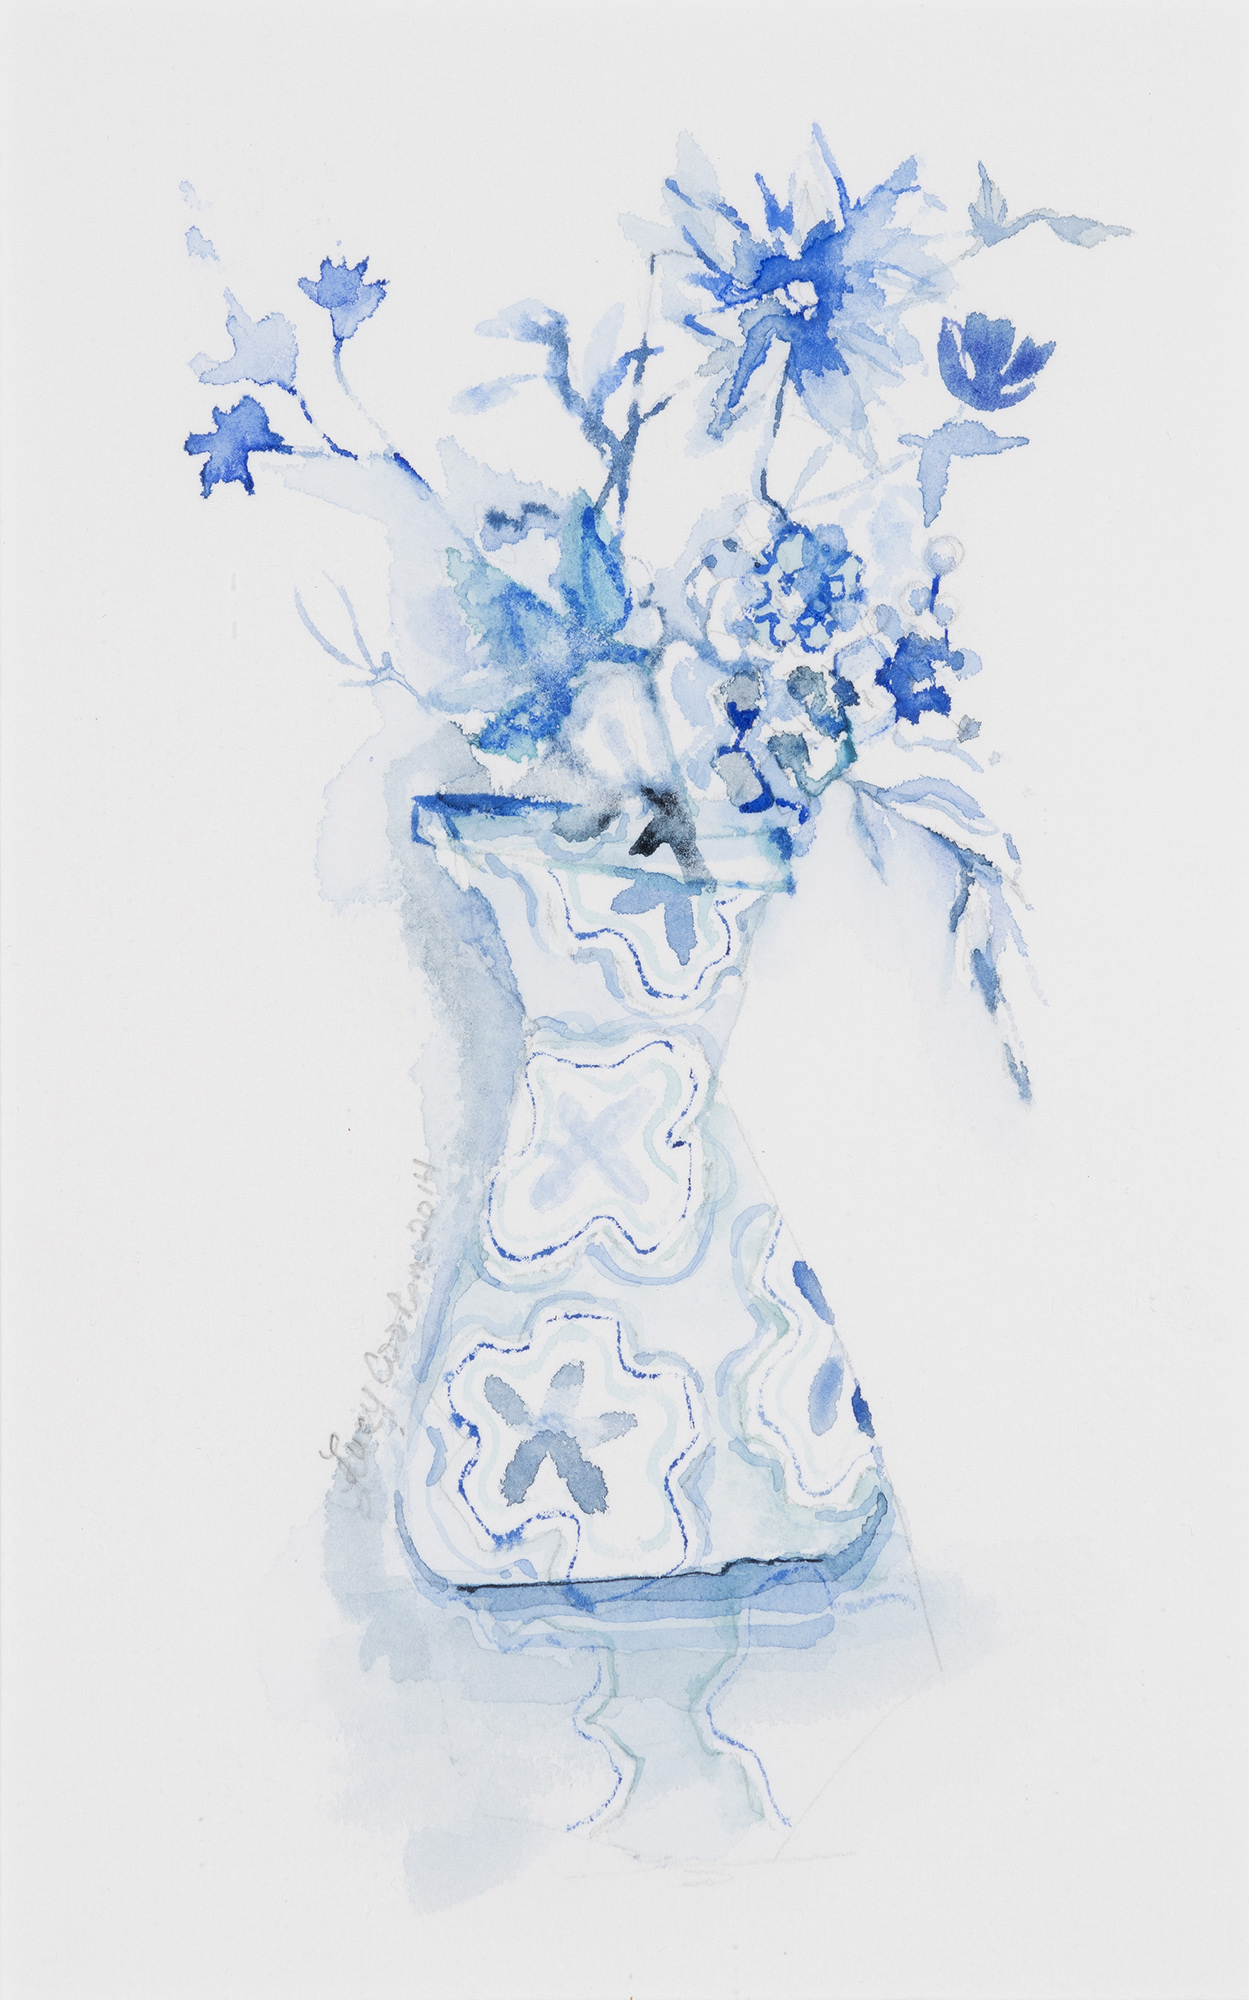 Blue Series II, 2014, Watercolor on paper, 17 x 13 in.